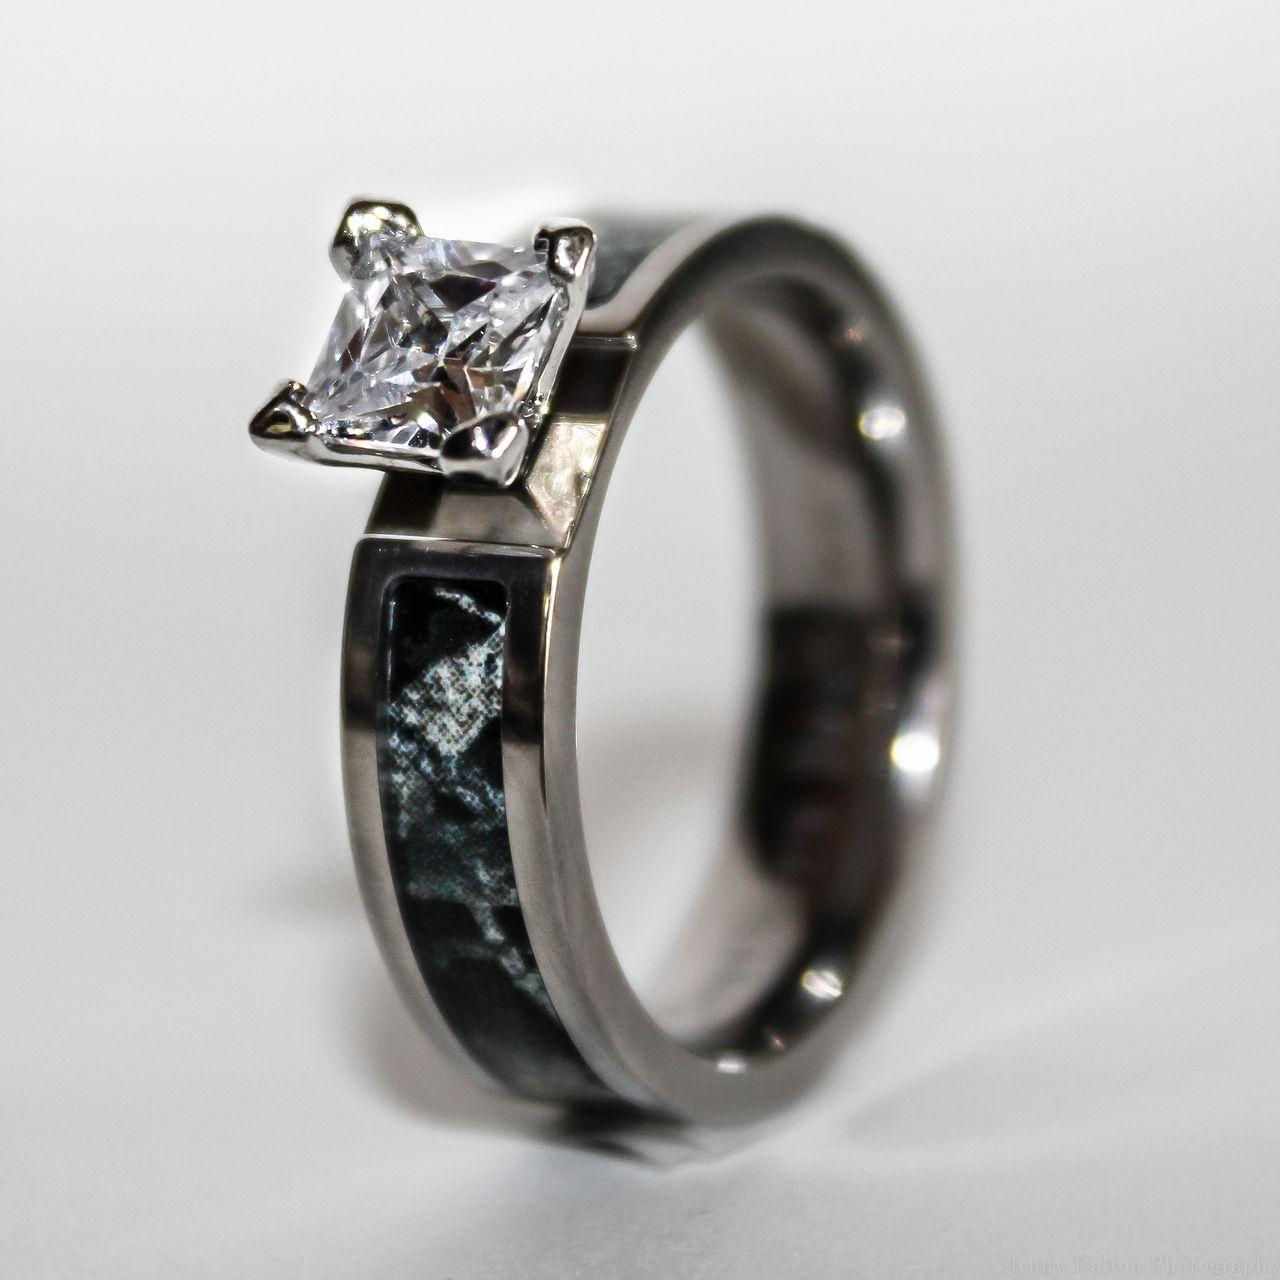 Black Camo Wedding Engagement Ring Titanium with CZ Stone ...